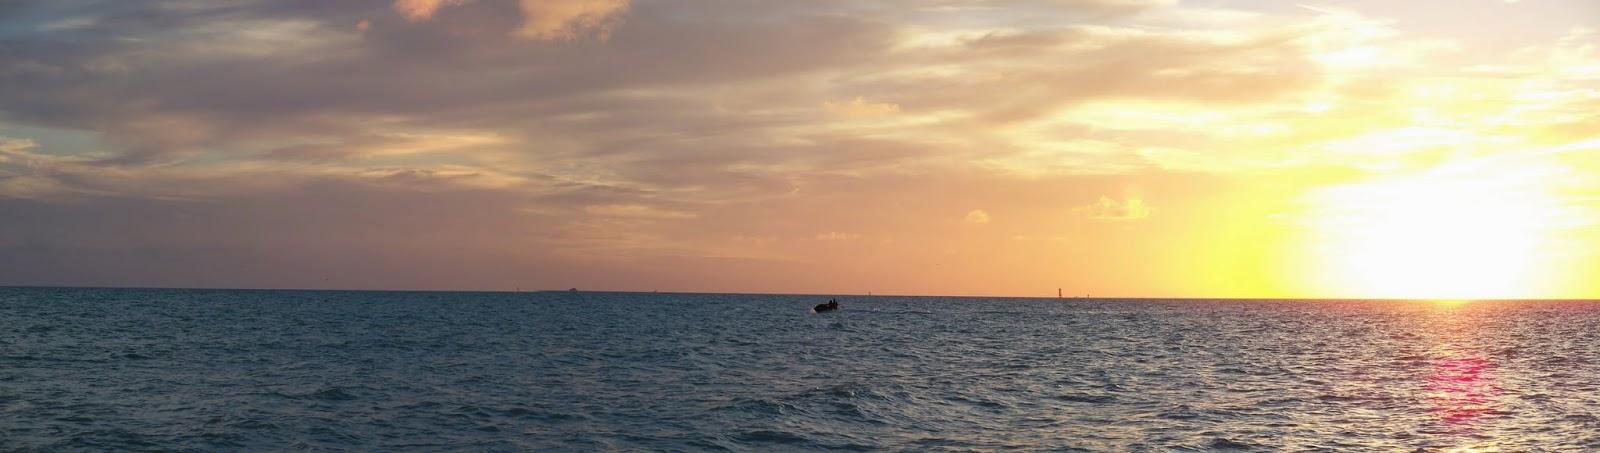 Key West Vacation - 116_5586.JPG